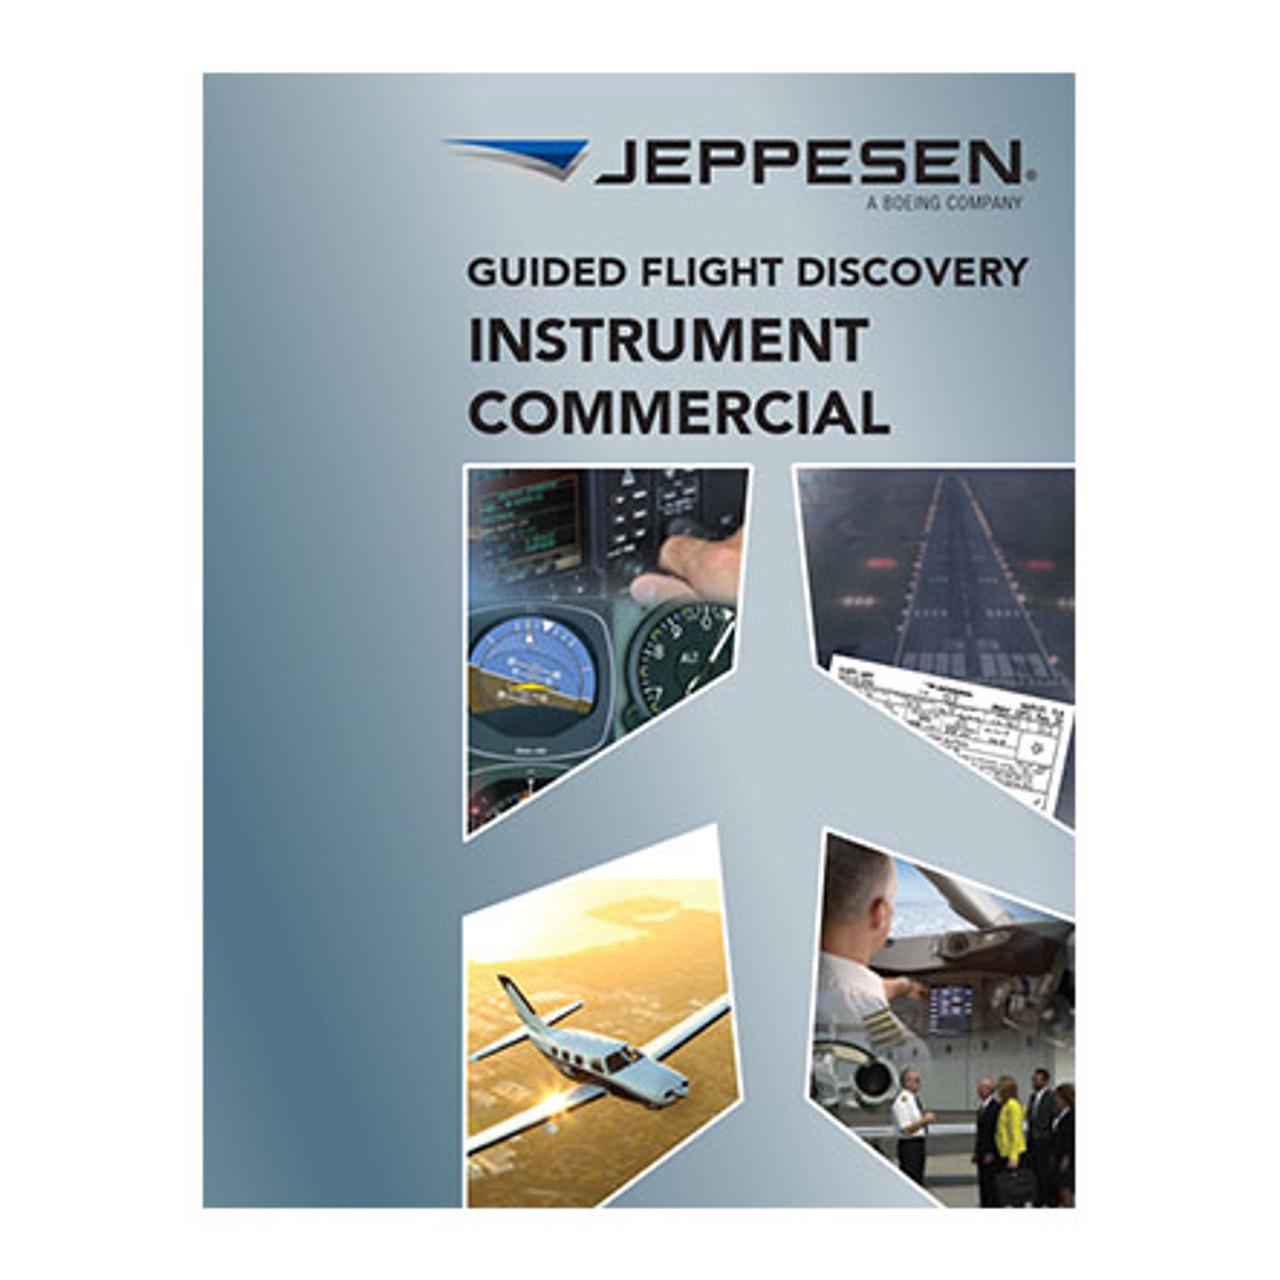 Jeppesen GFD Instrument Commercial Manual